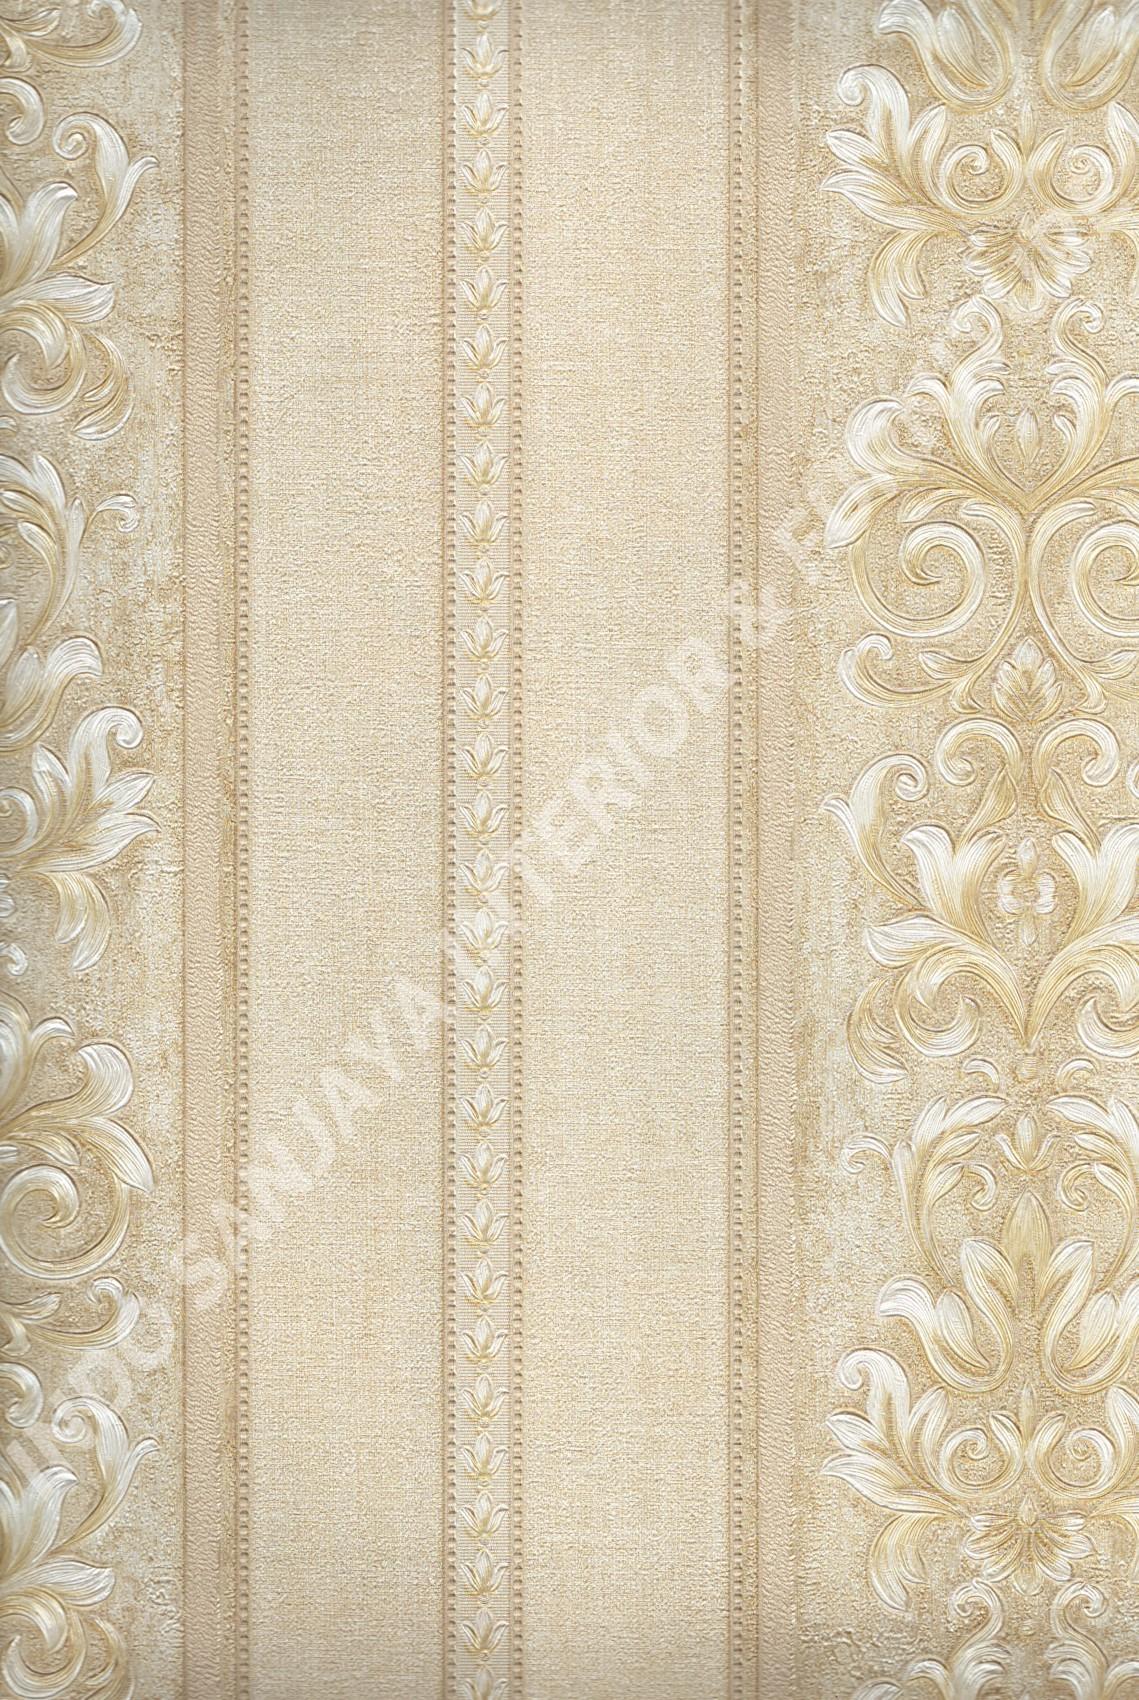 wallpaper   Wallpaper Klasik Batik (Damask) YG80602:YG80602 corak  warna